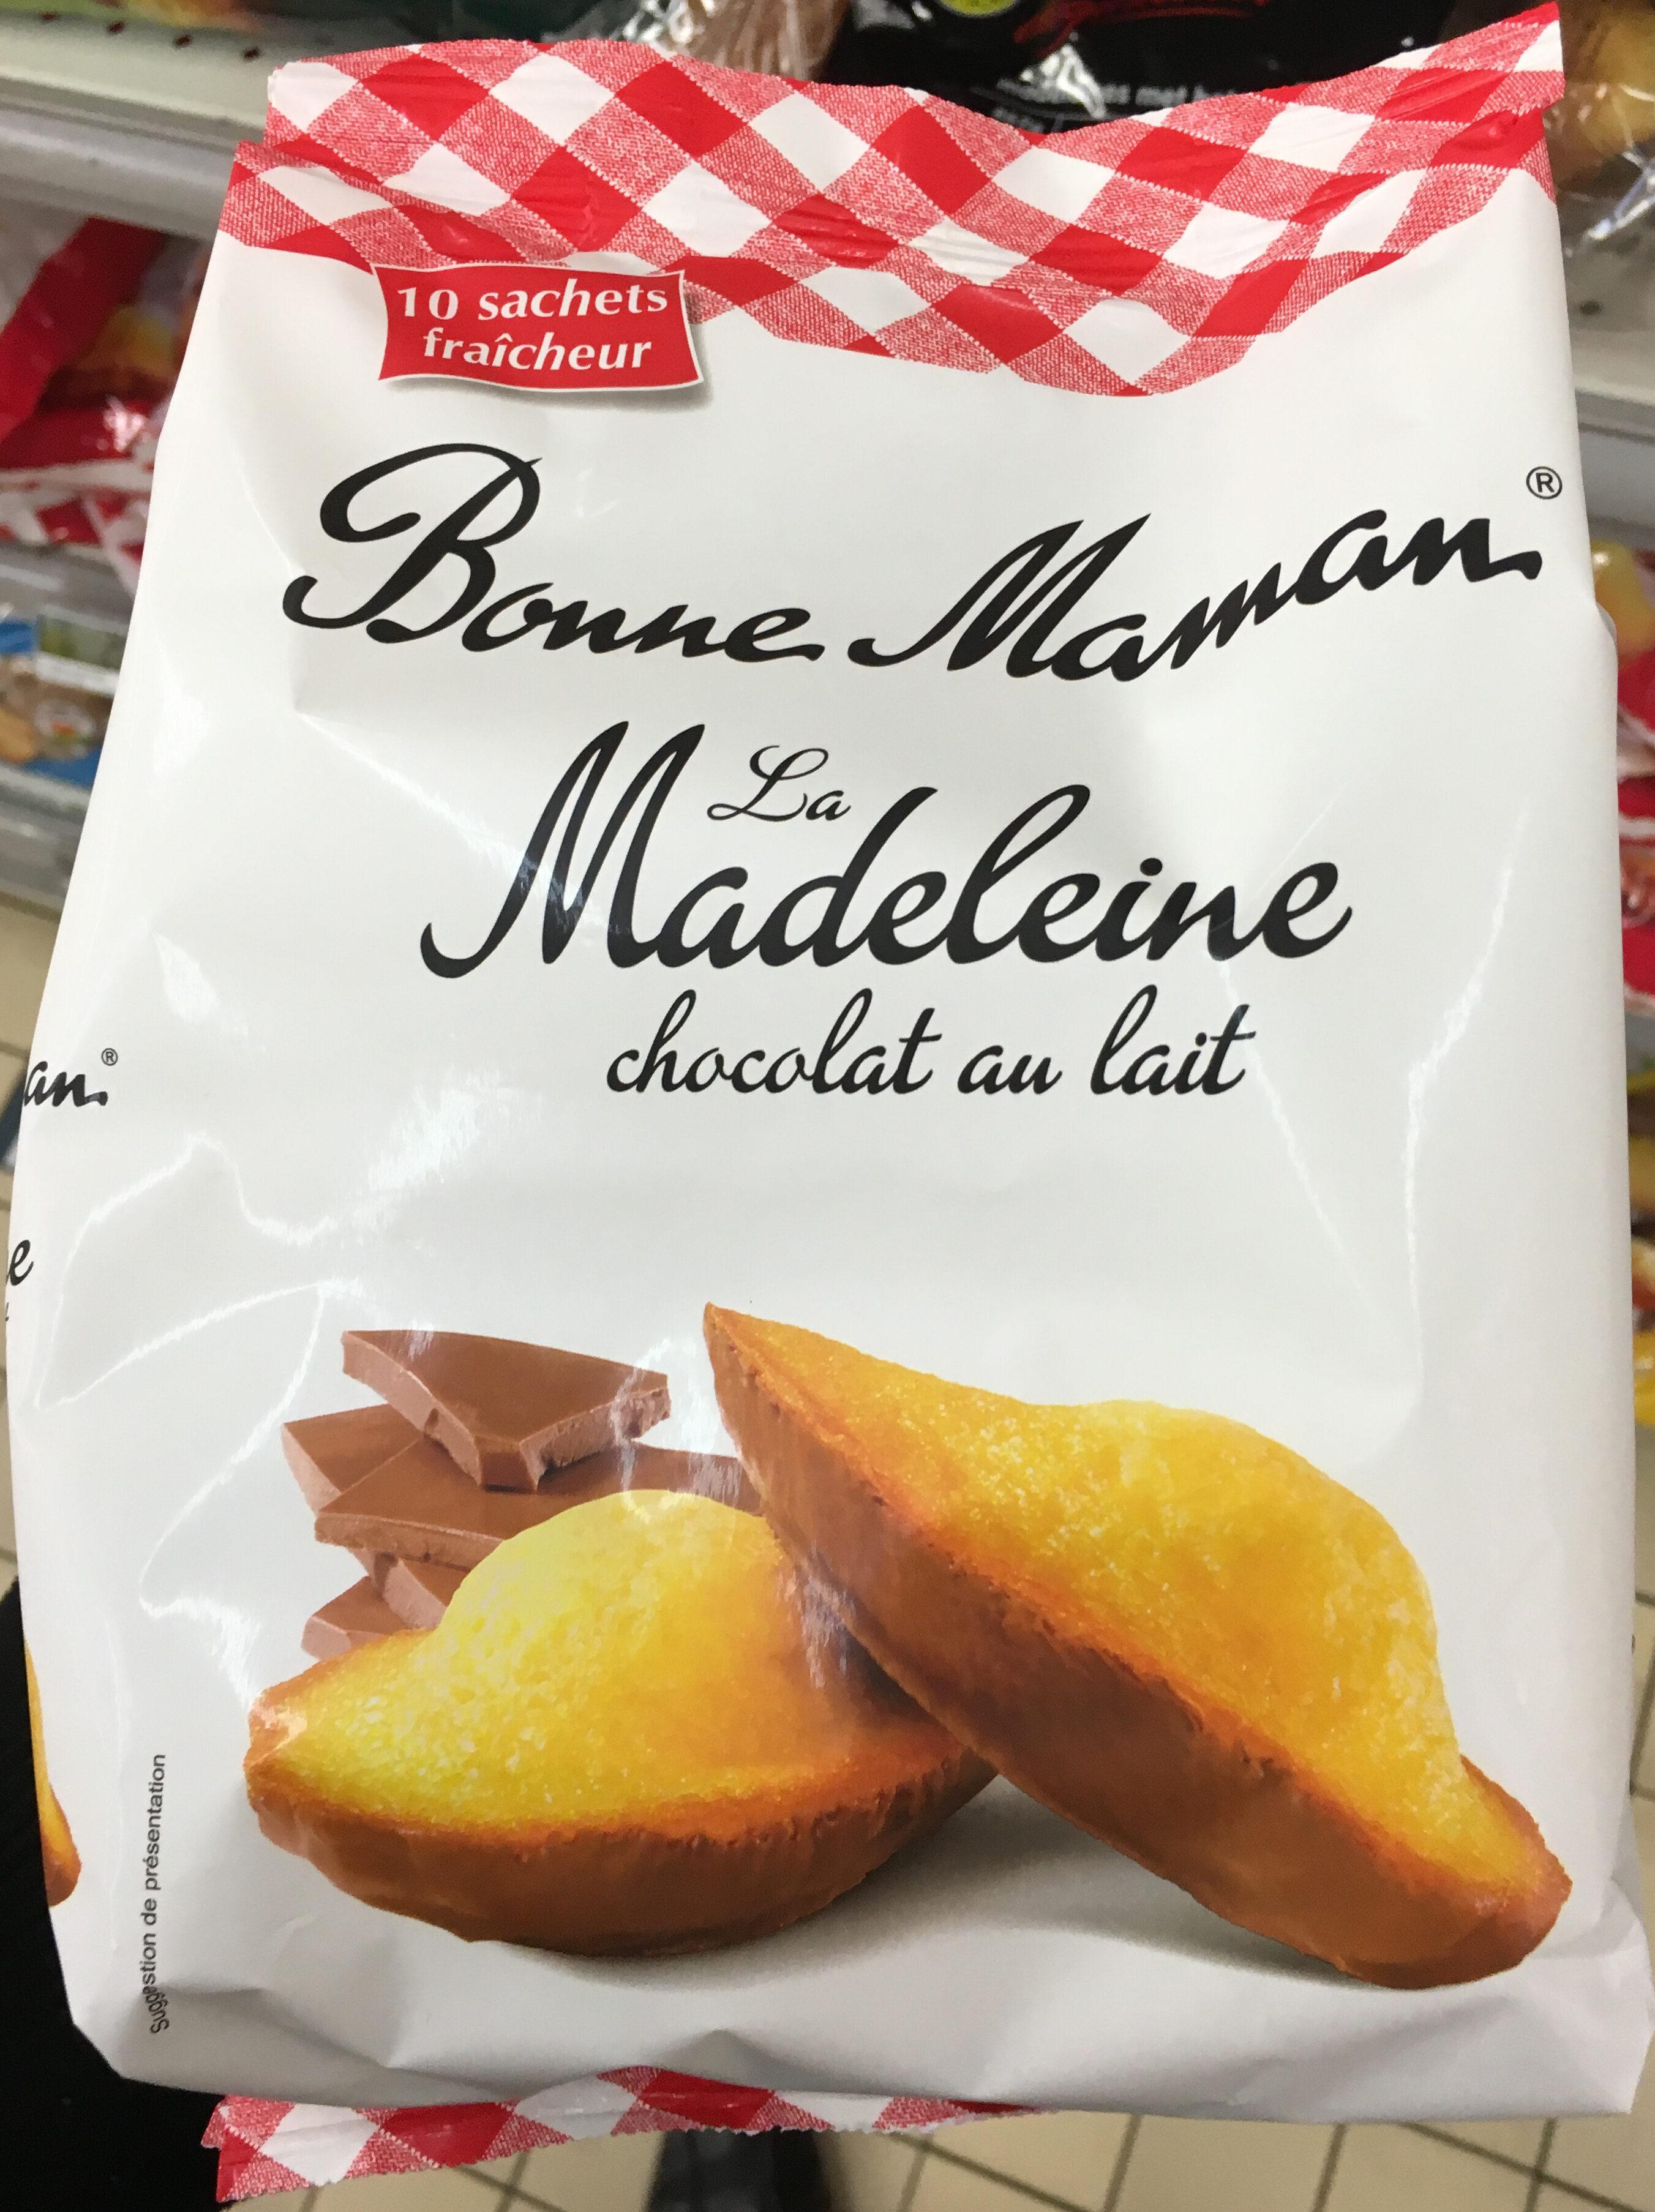 La madeleine chocolat au lait. - Product - fr